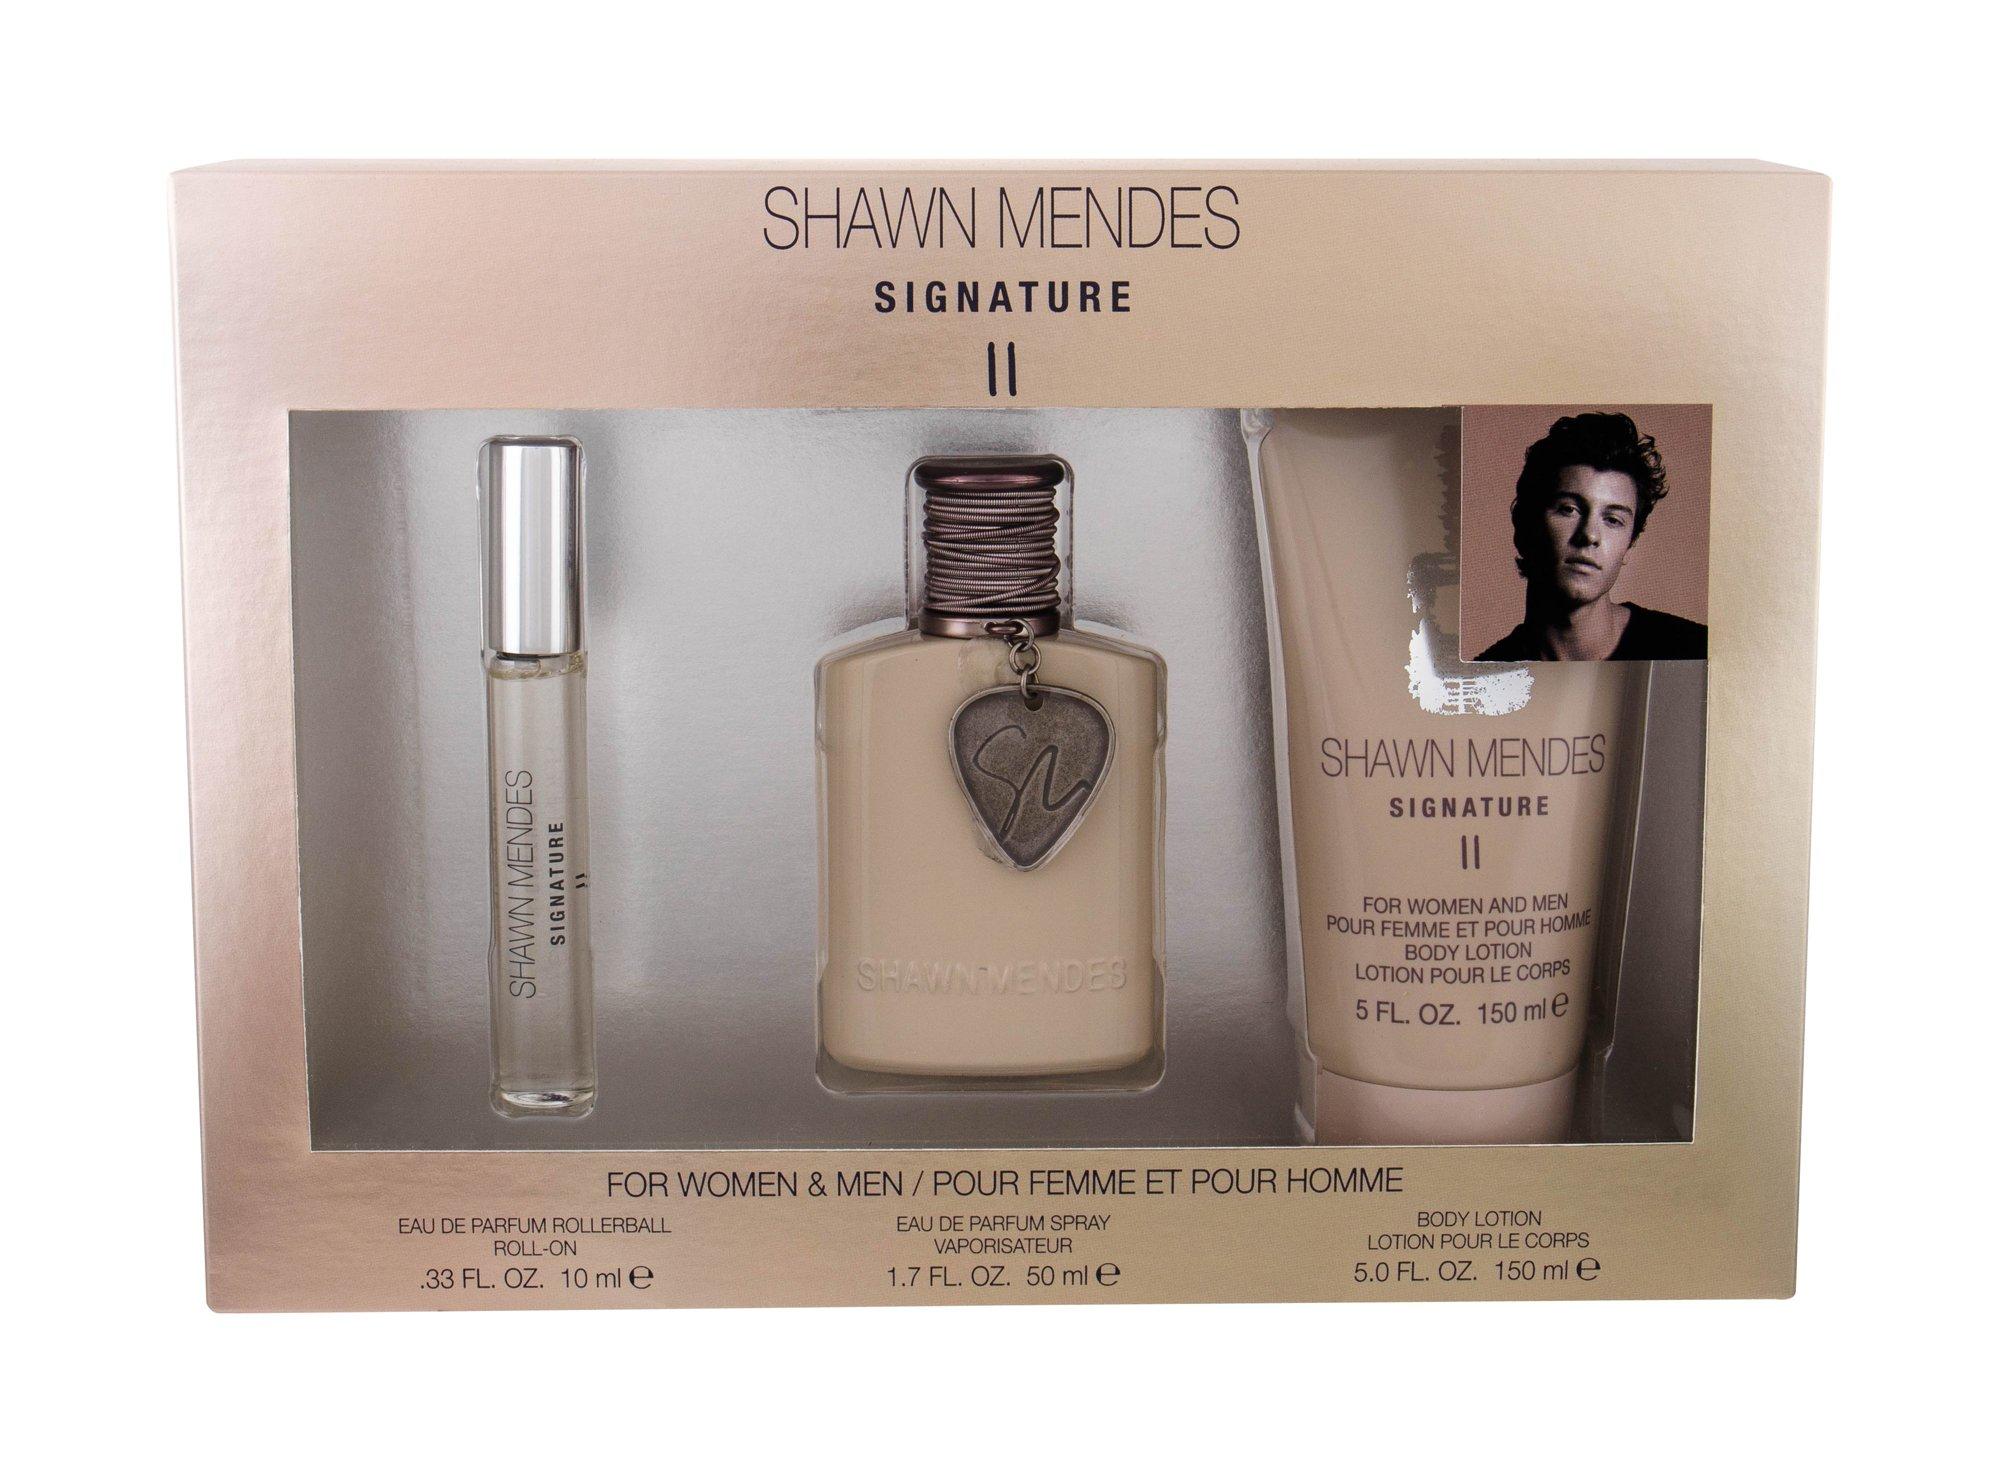 Shawn Mendes Signature II Eau de Parfum 50ml